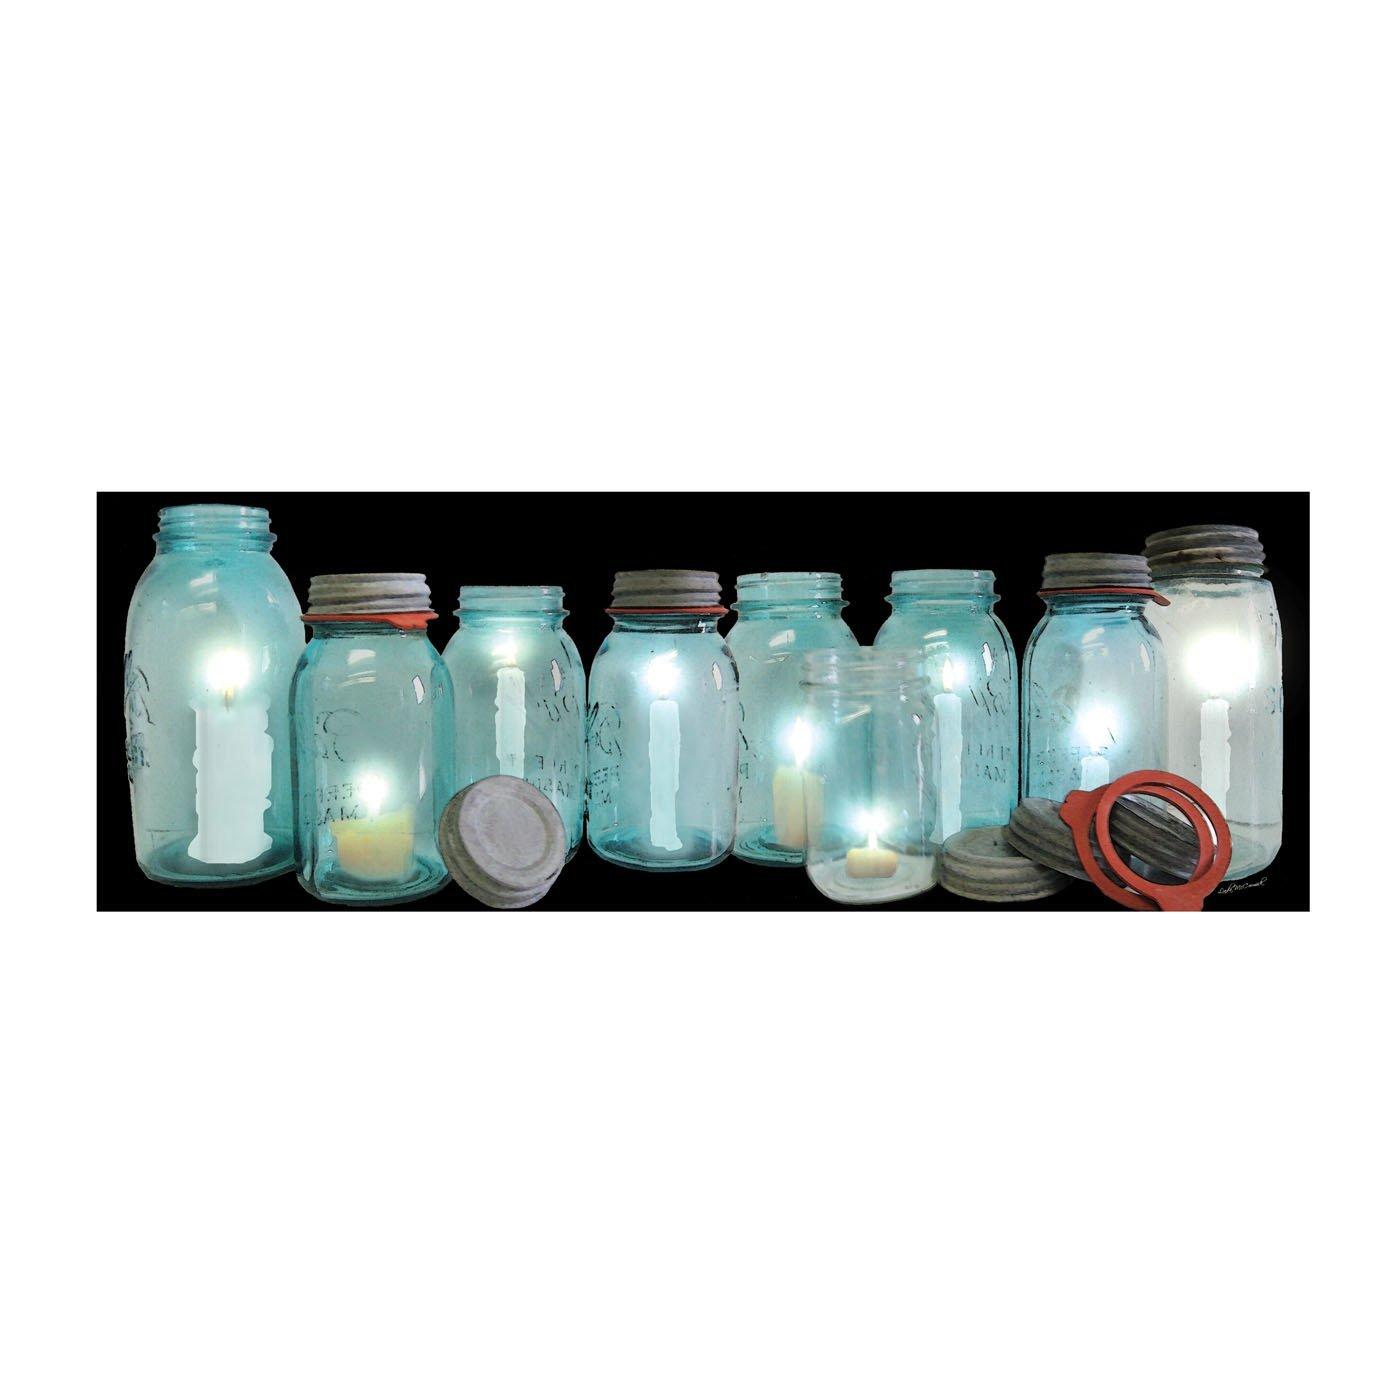 1400x1400 Ohio Wholesale Radiance Lighted Row Of Canning Jars